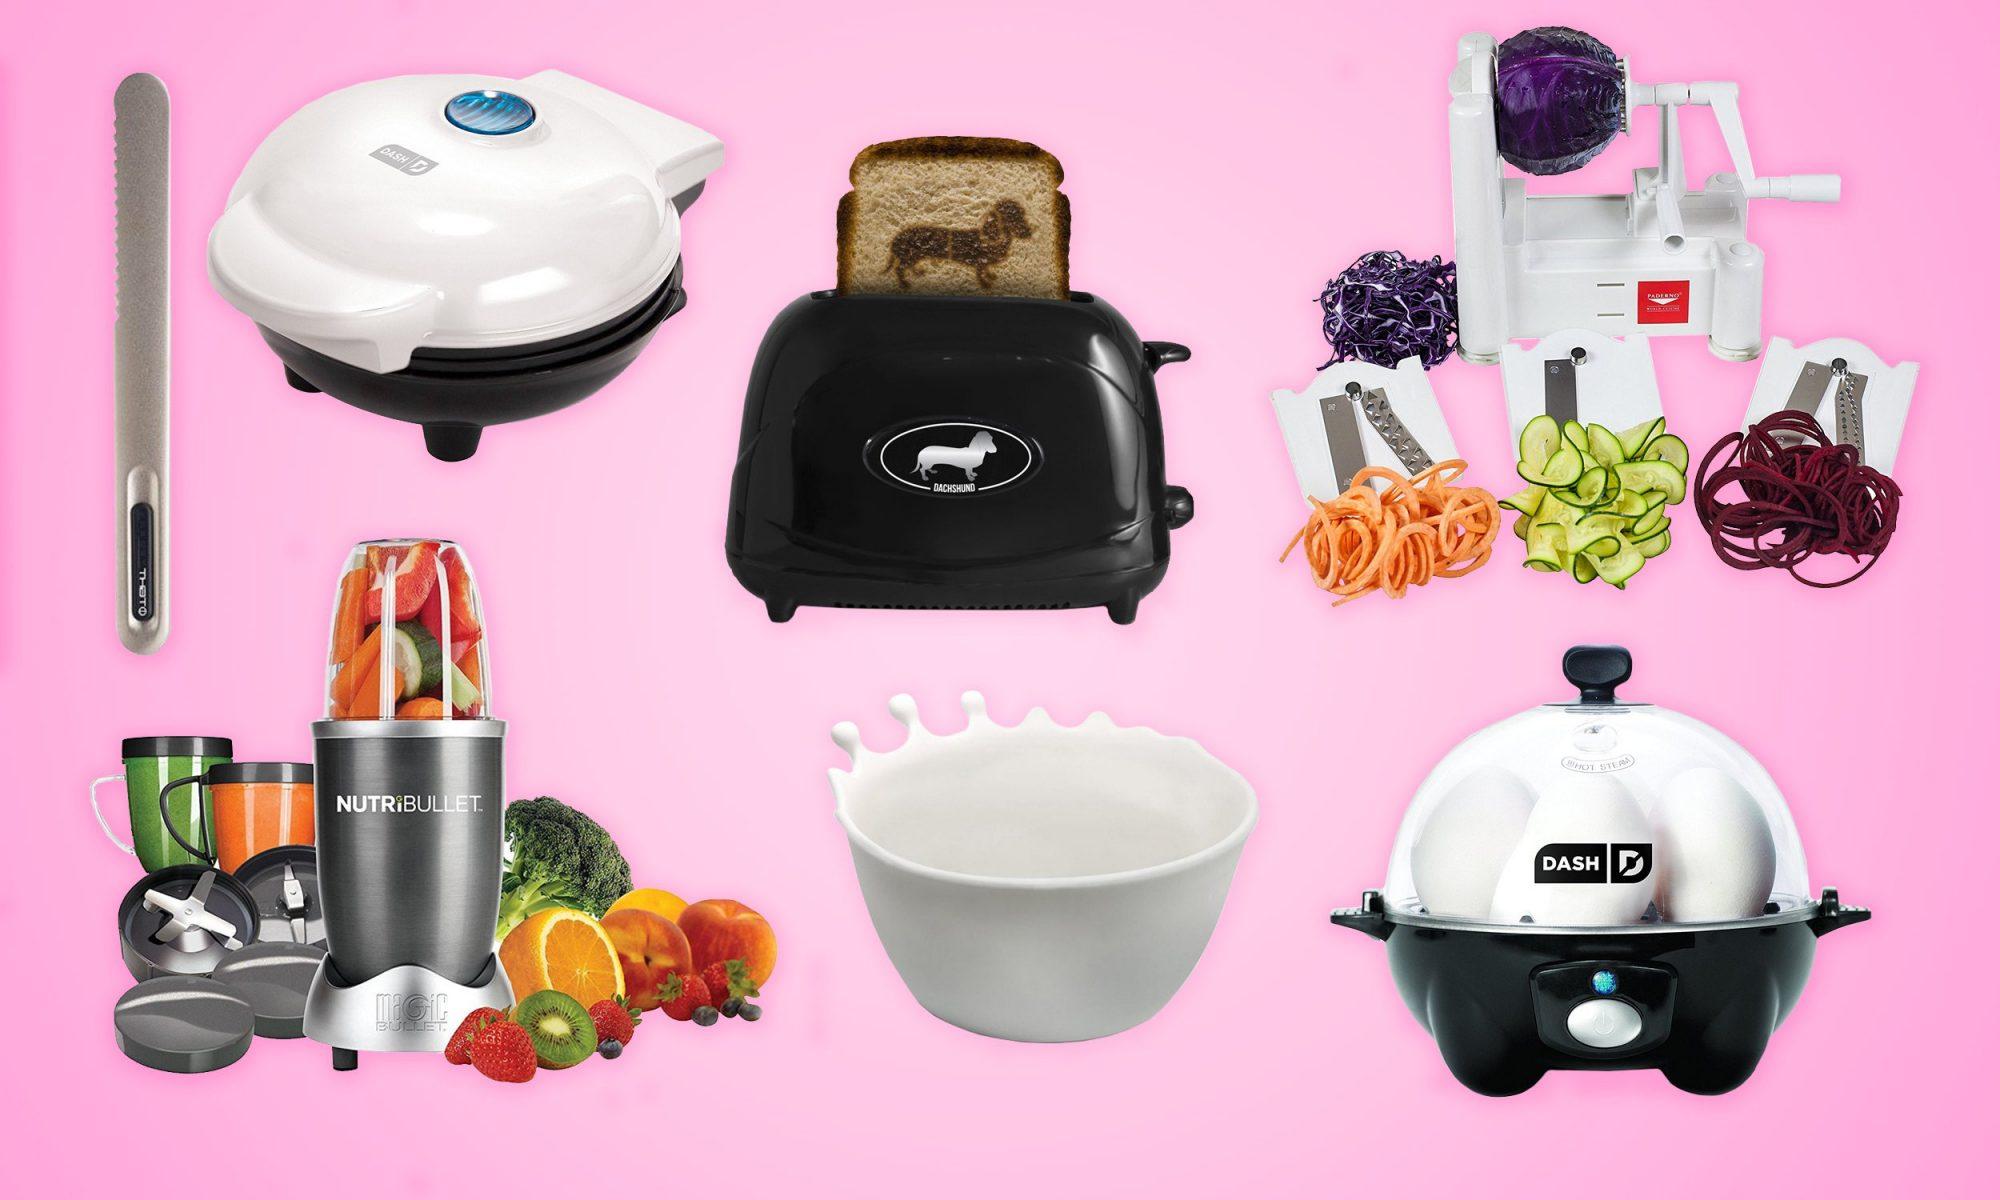 EC: The Best Breakfast Gear to Buy on Amazon Prime Day